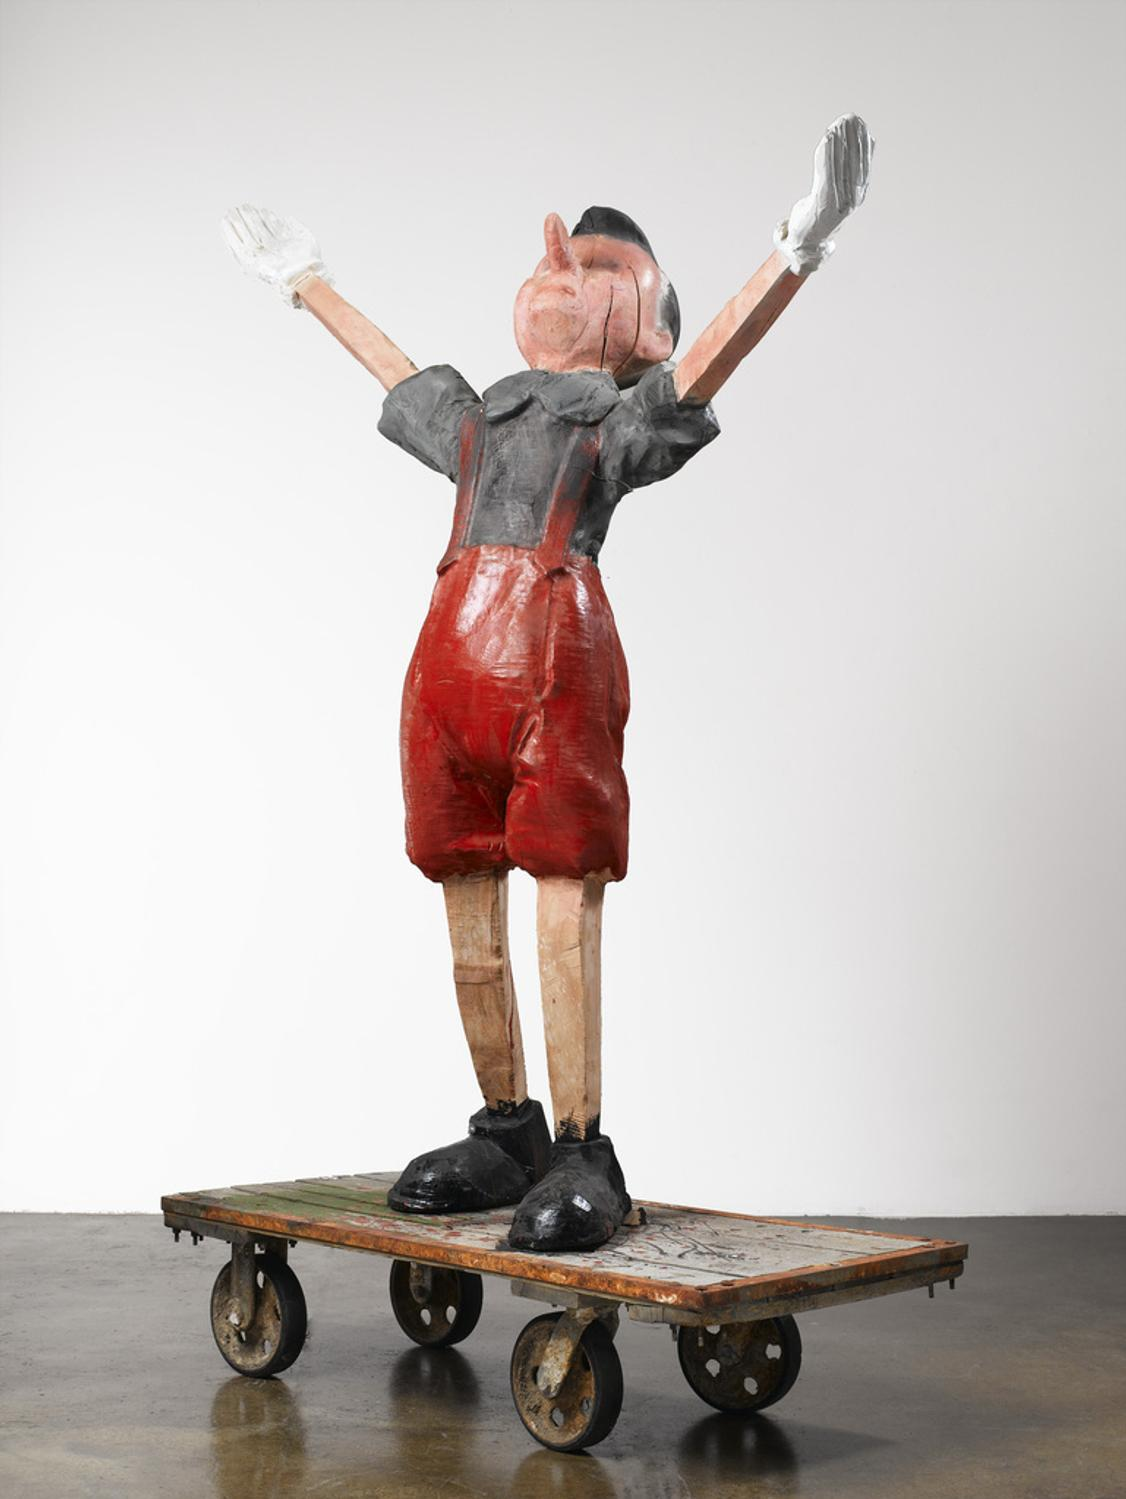 Cancel Which Membership >> Nassau County Museum of Art Presents Sculpture / Jim Dine / Pinocchio - Artwire Press Release ...